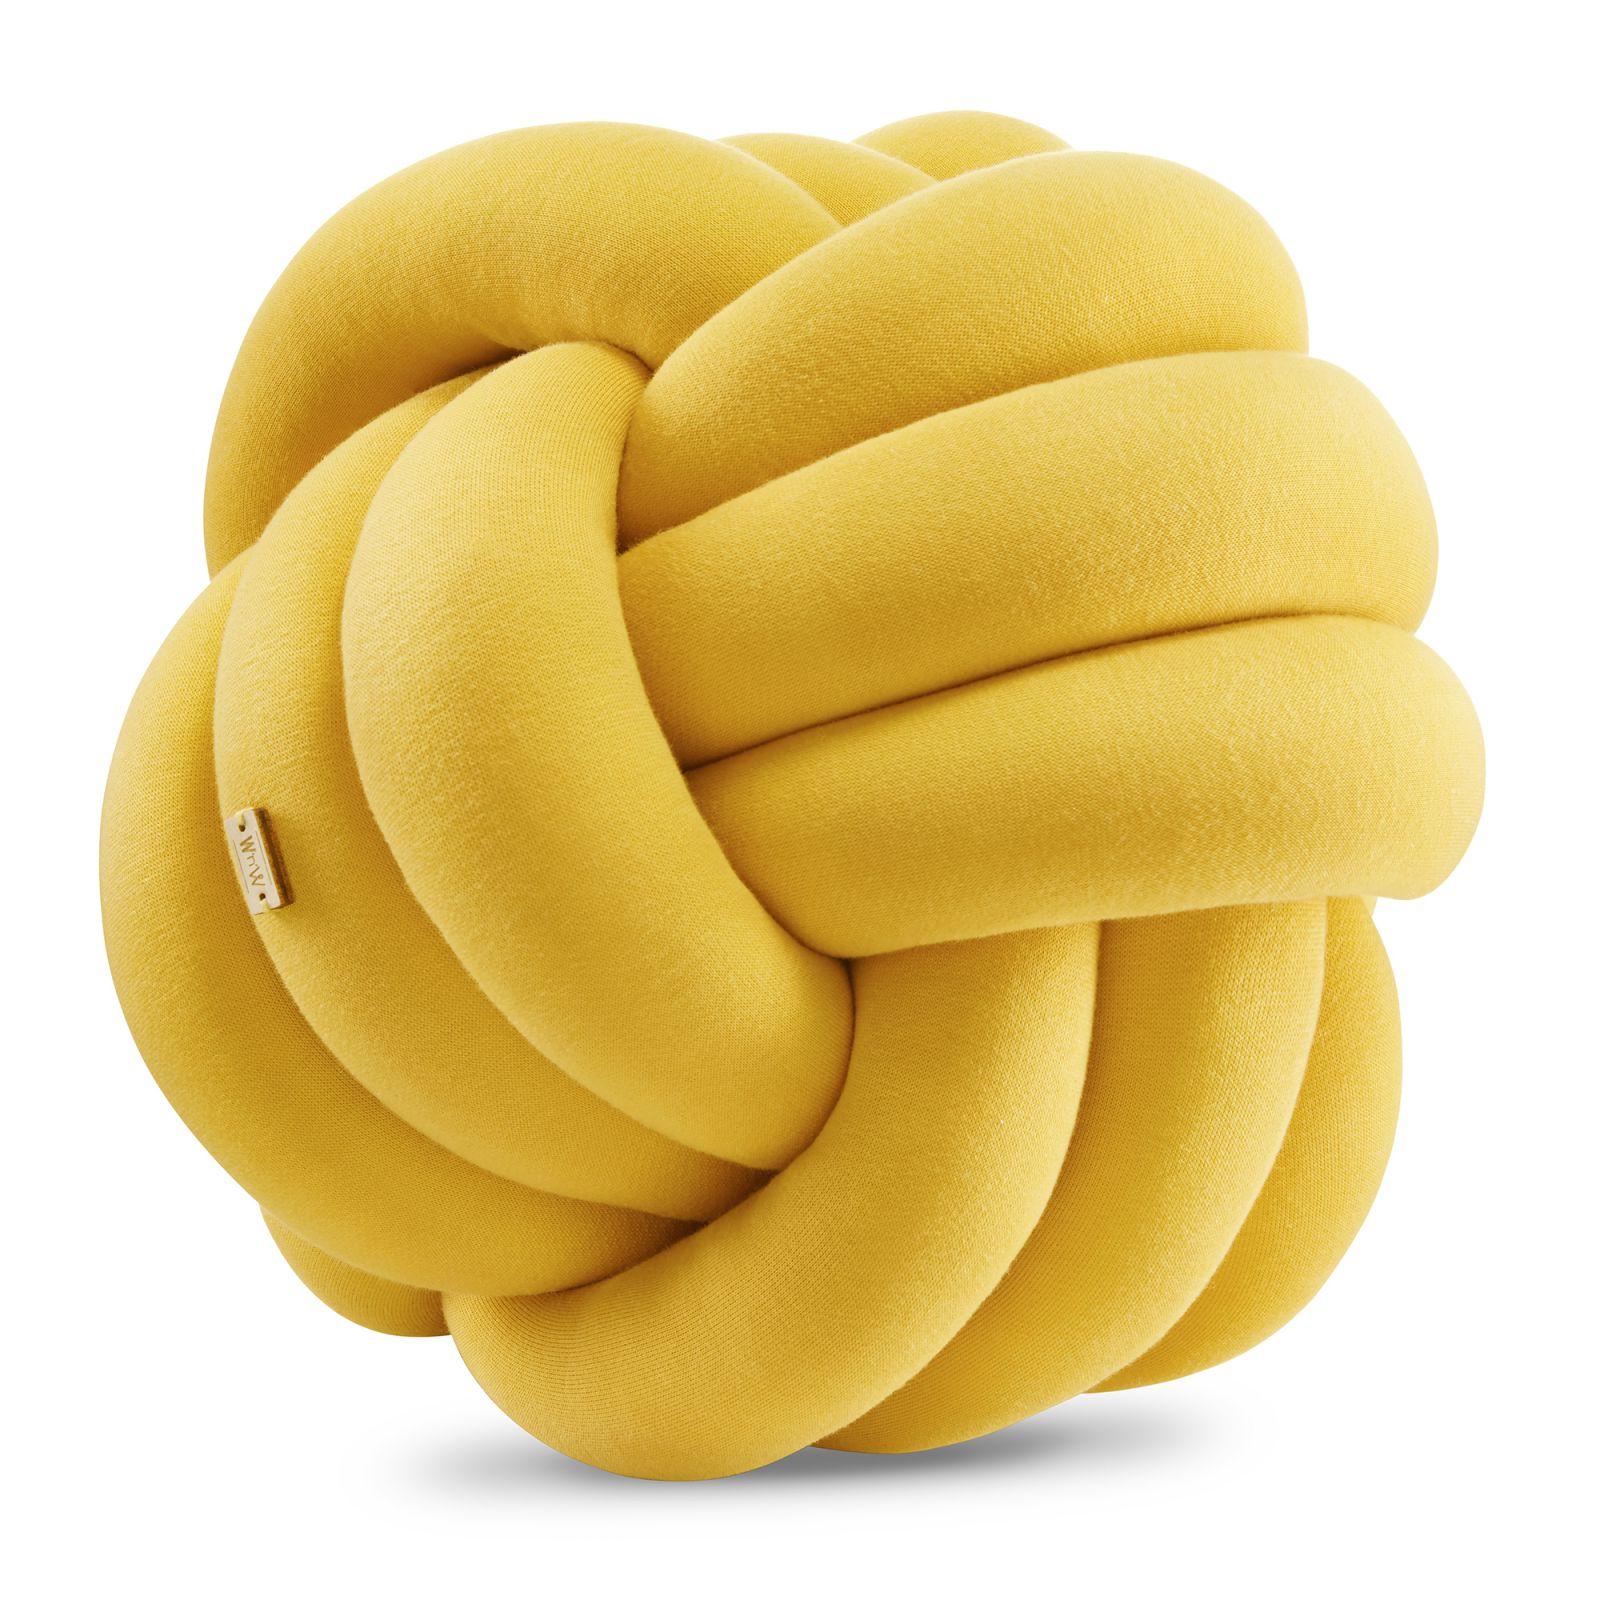 Supeł Ball musztardowy // mustard